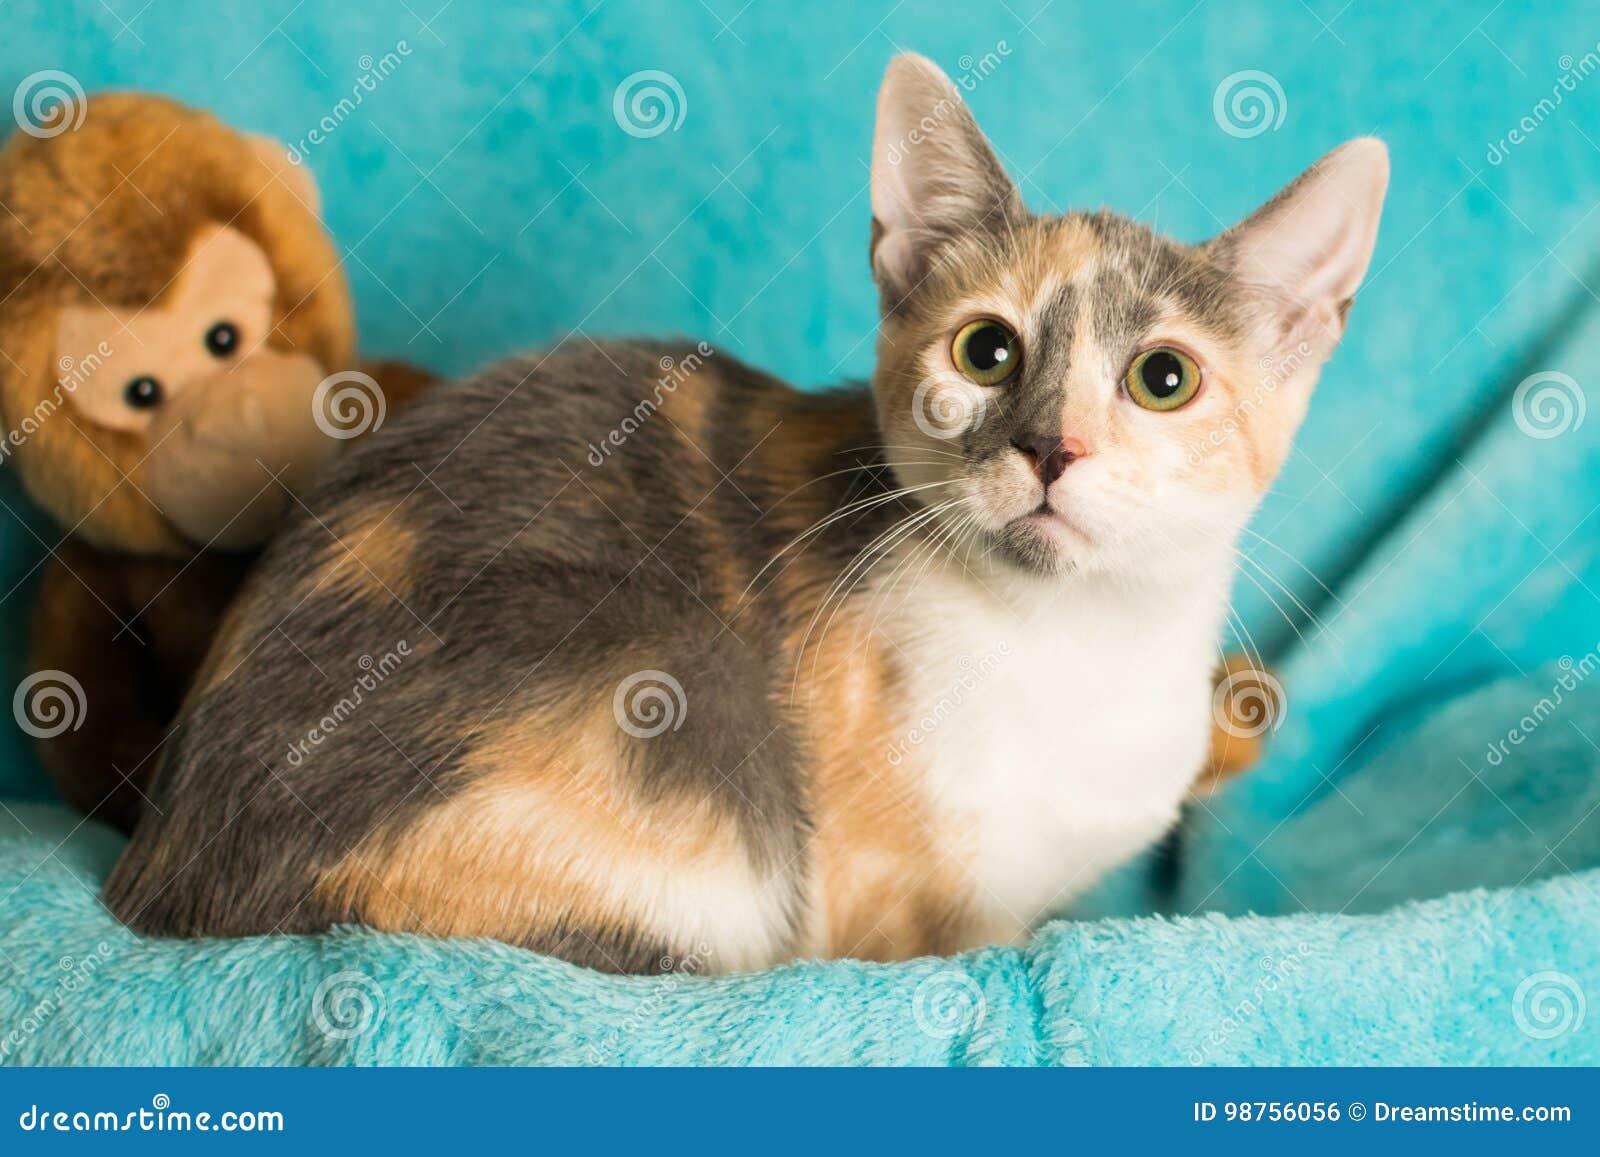 Calico kitten stock photo  Image of grey, long, eyes - 98756056